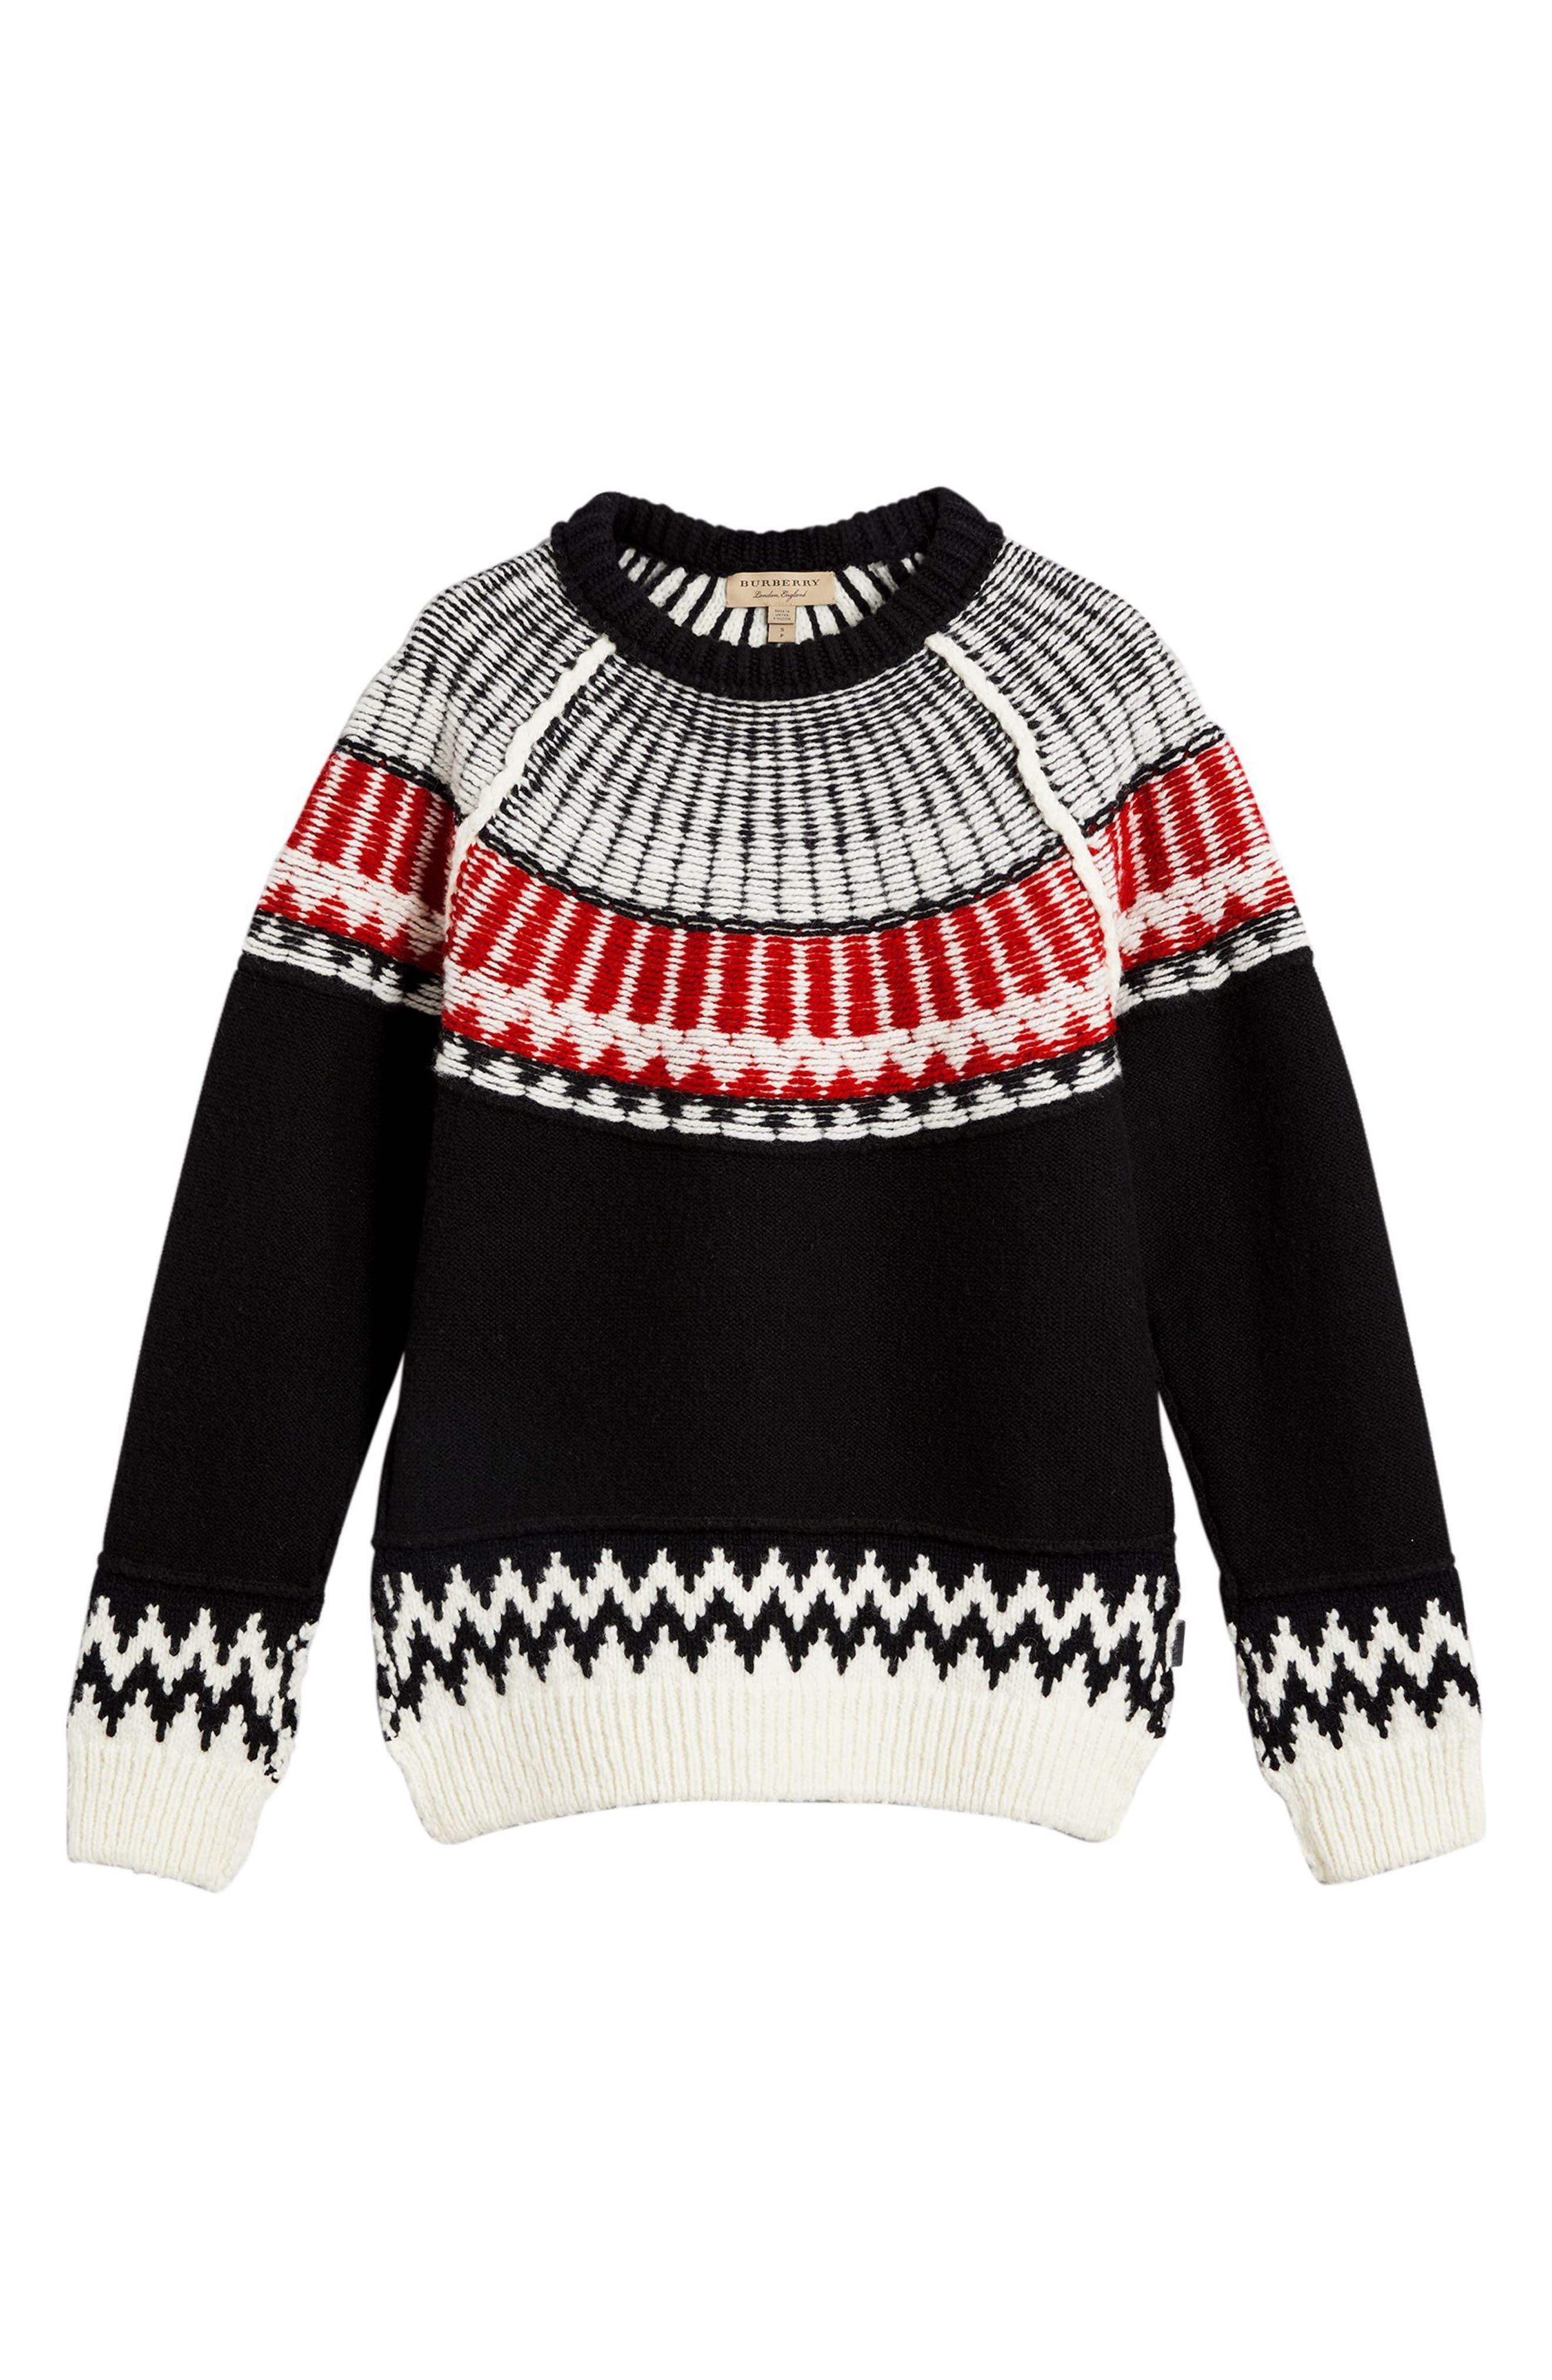 Trycroft Fair Isle Wool Blend Sweater,                             Alternate thumbnail 4, color,                             001